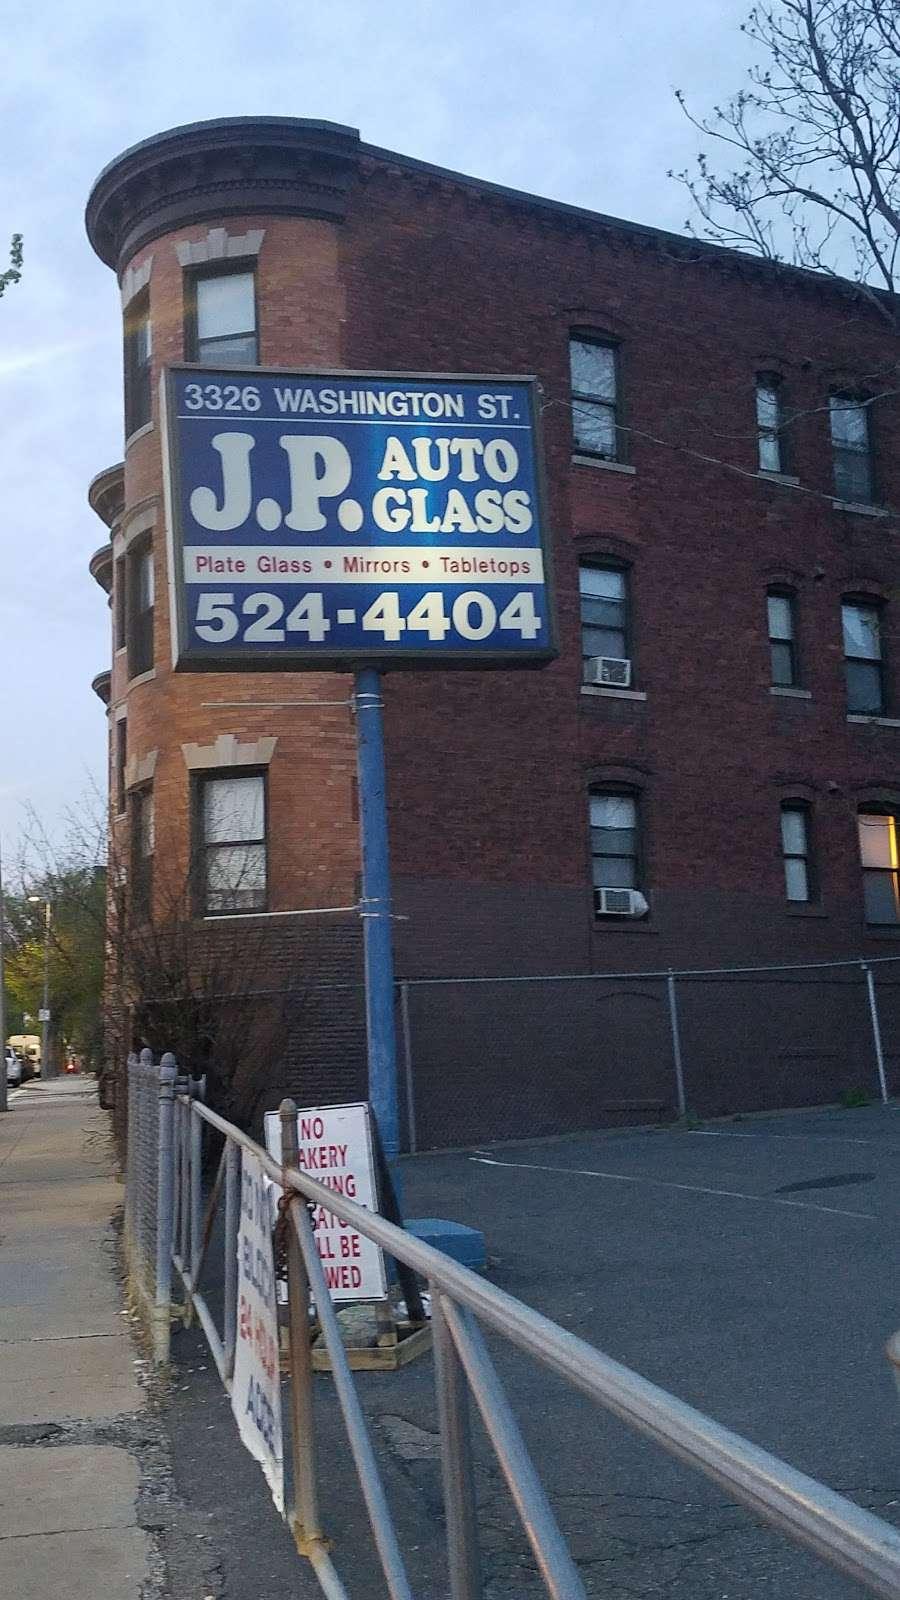 J P Auto Glass - car repair    Photo 2 of 2   Address: 3326 Washington St, Jamaica Plain, MA 02130, USA   Phone: (617) 524-4404